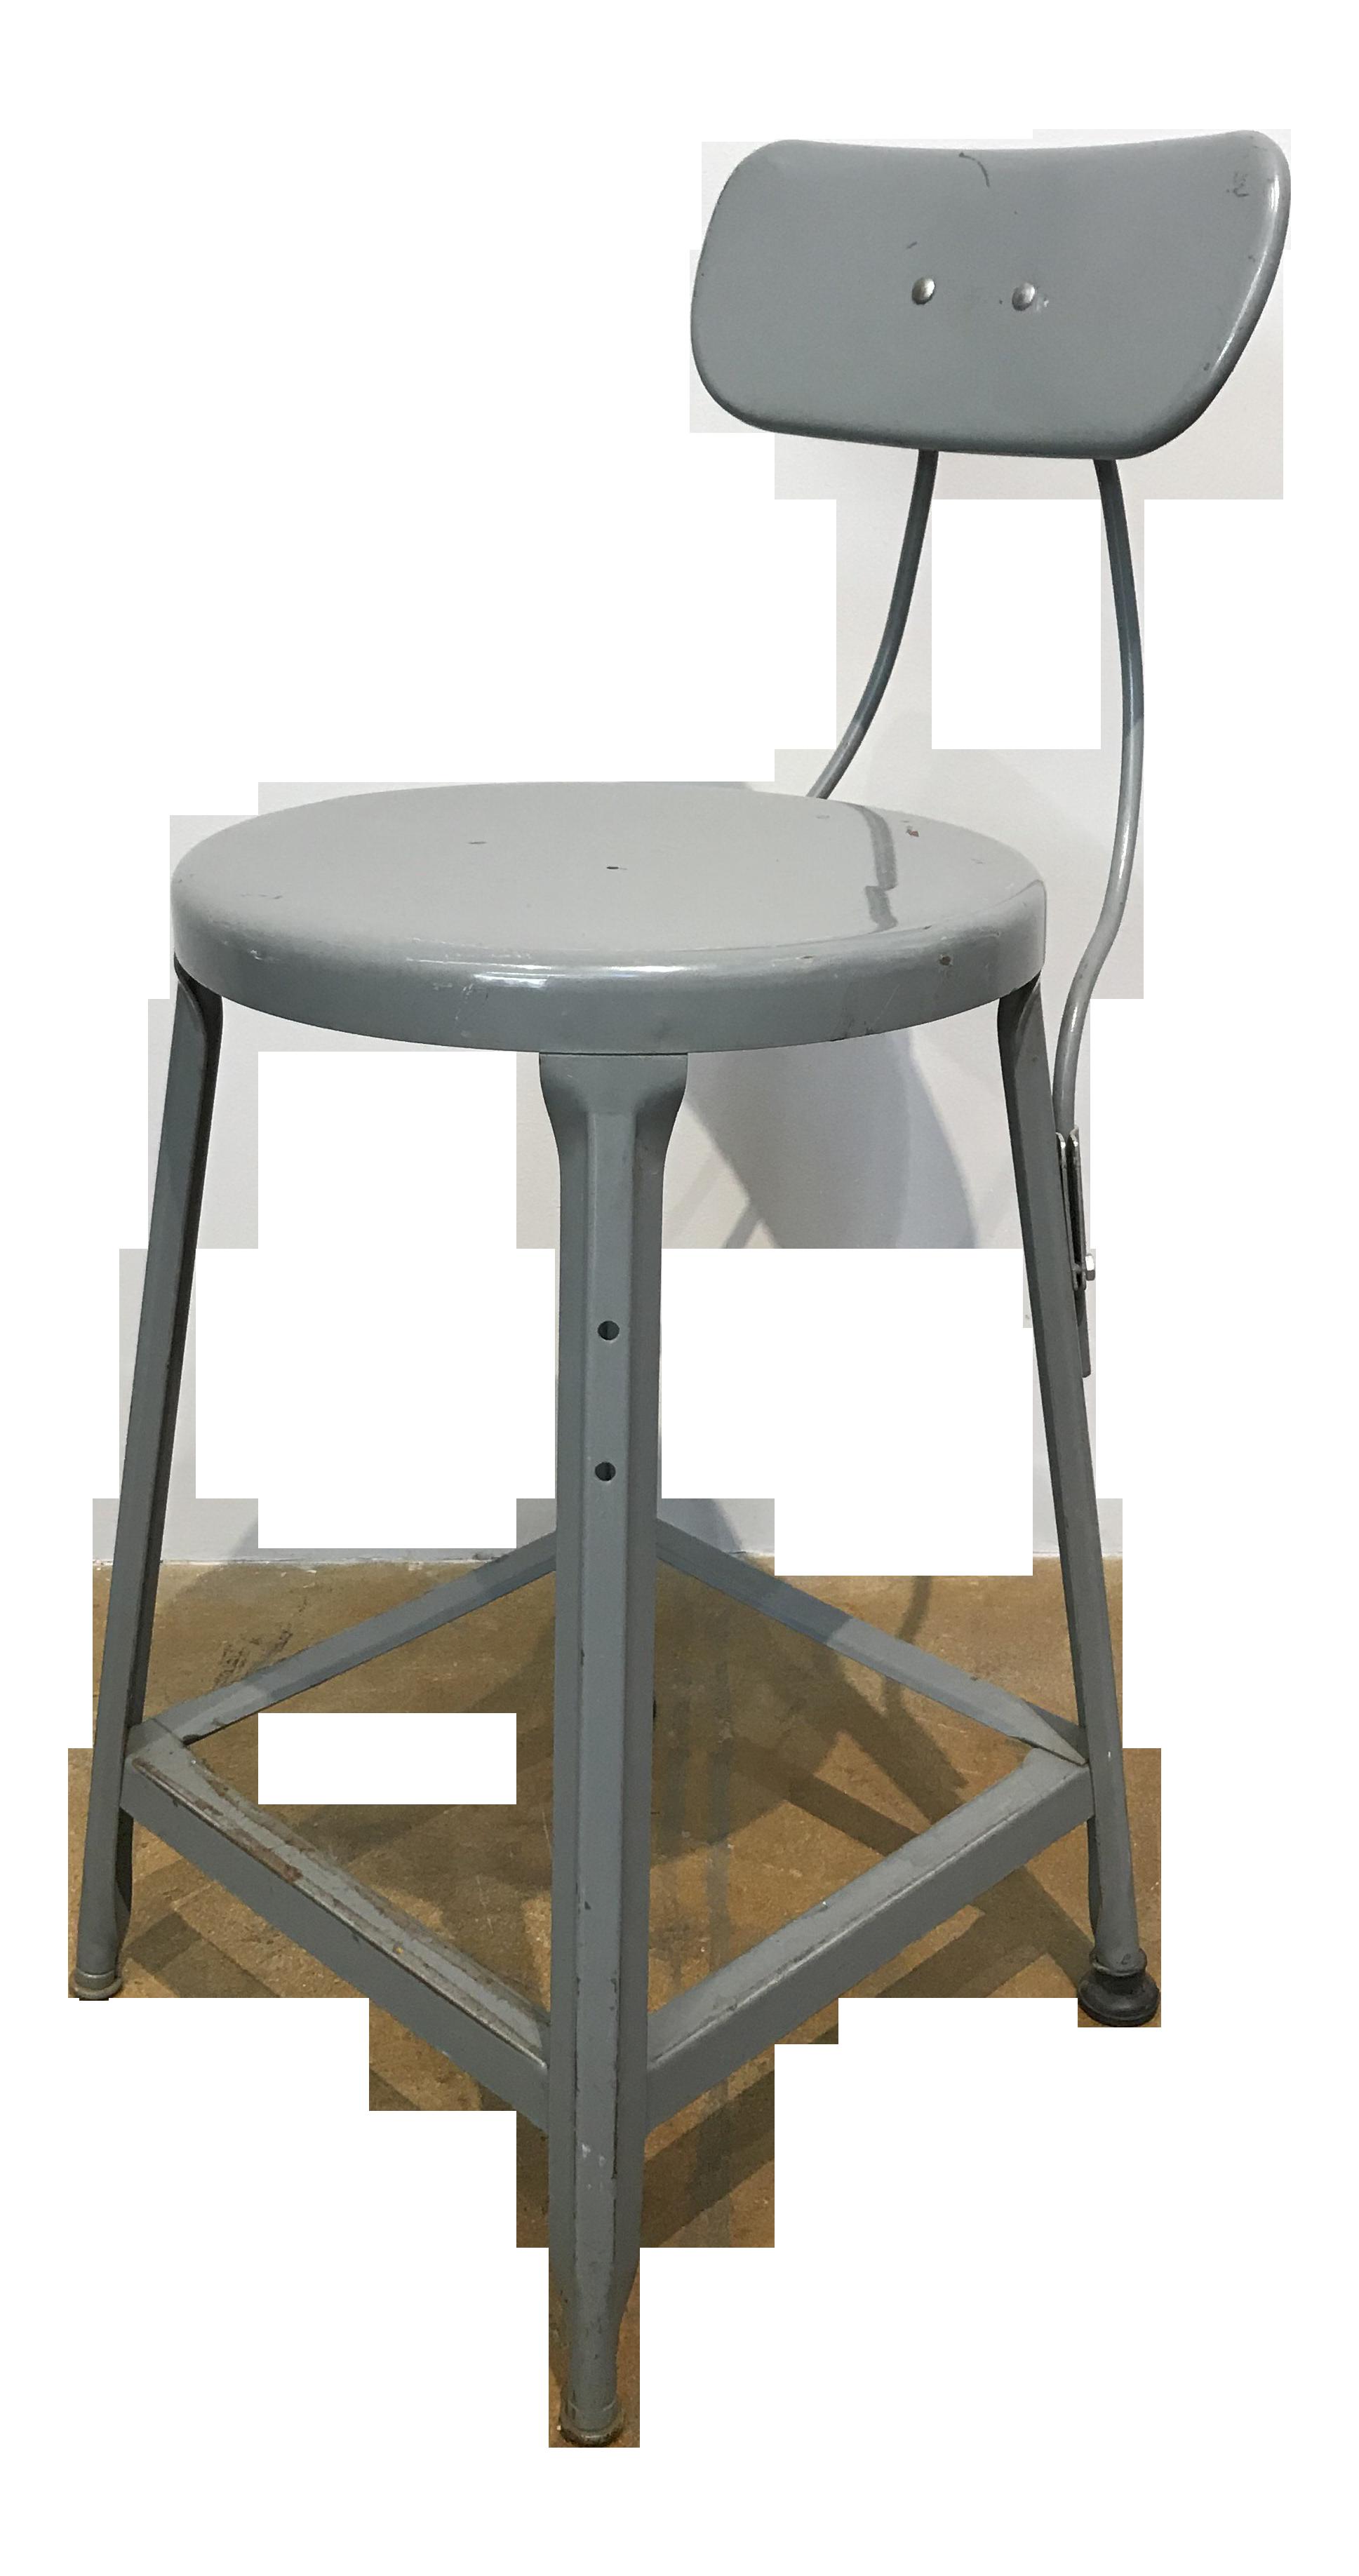 Super Vintage Industrial Metal Stool Inzonedesignstudio Interior Chair Design Inzonedesignstudiocom